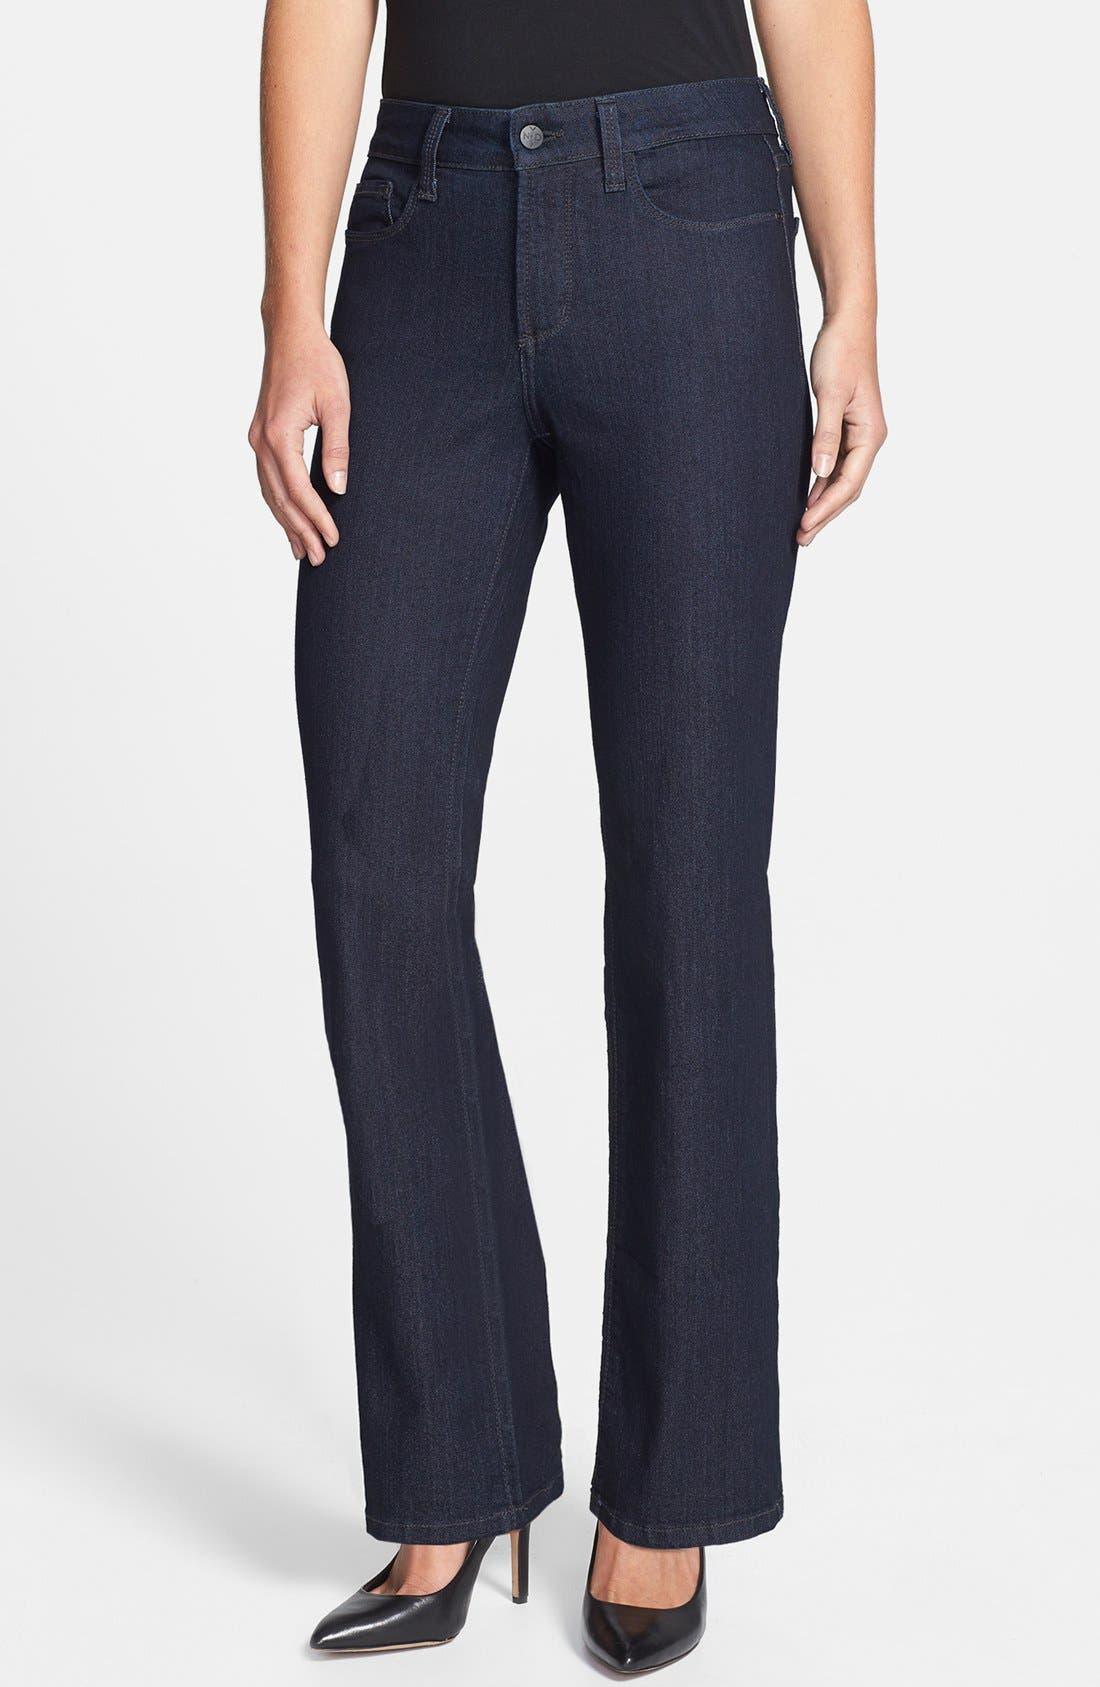 Alternate Image 1 Selected - NYDJ 'Marilyn' Straight Leg Jeans (Dark Enzyme) (Petite)